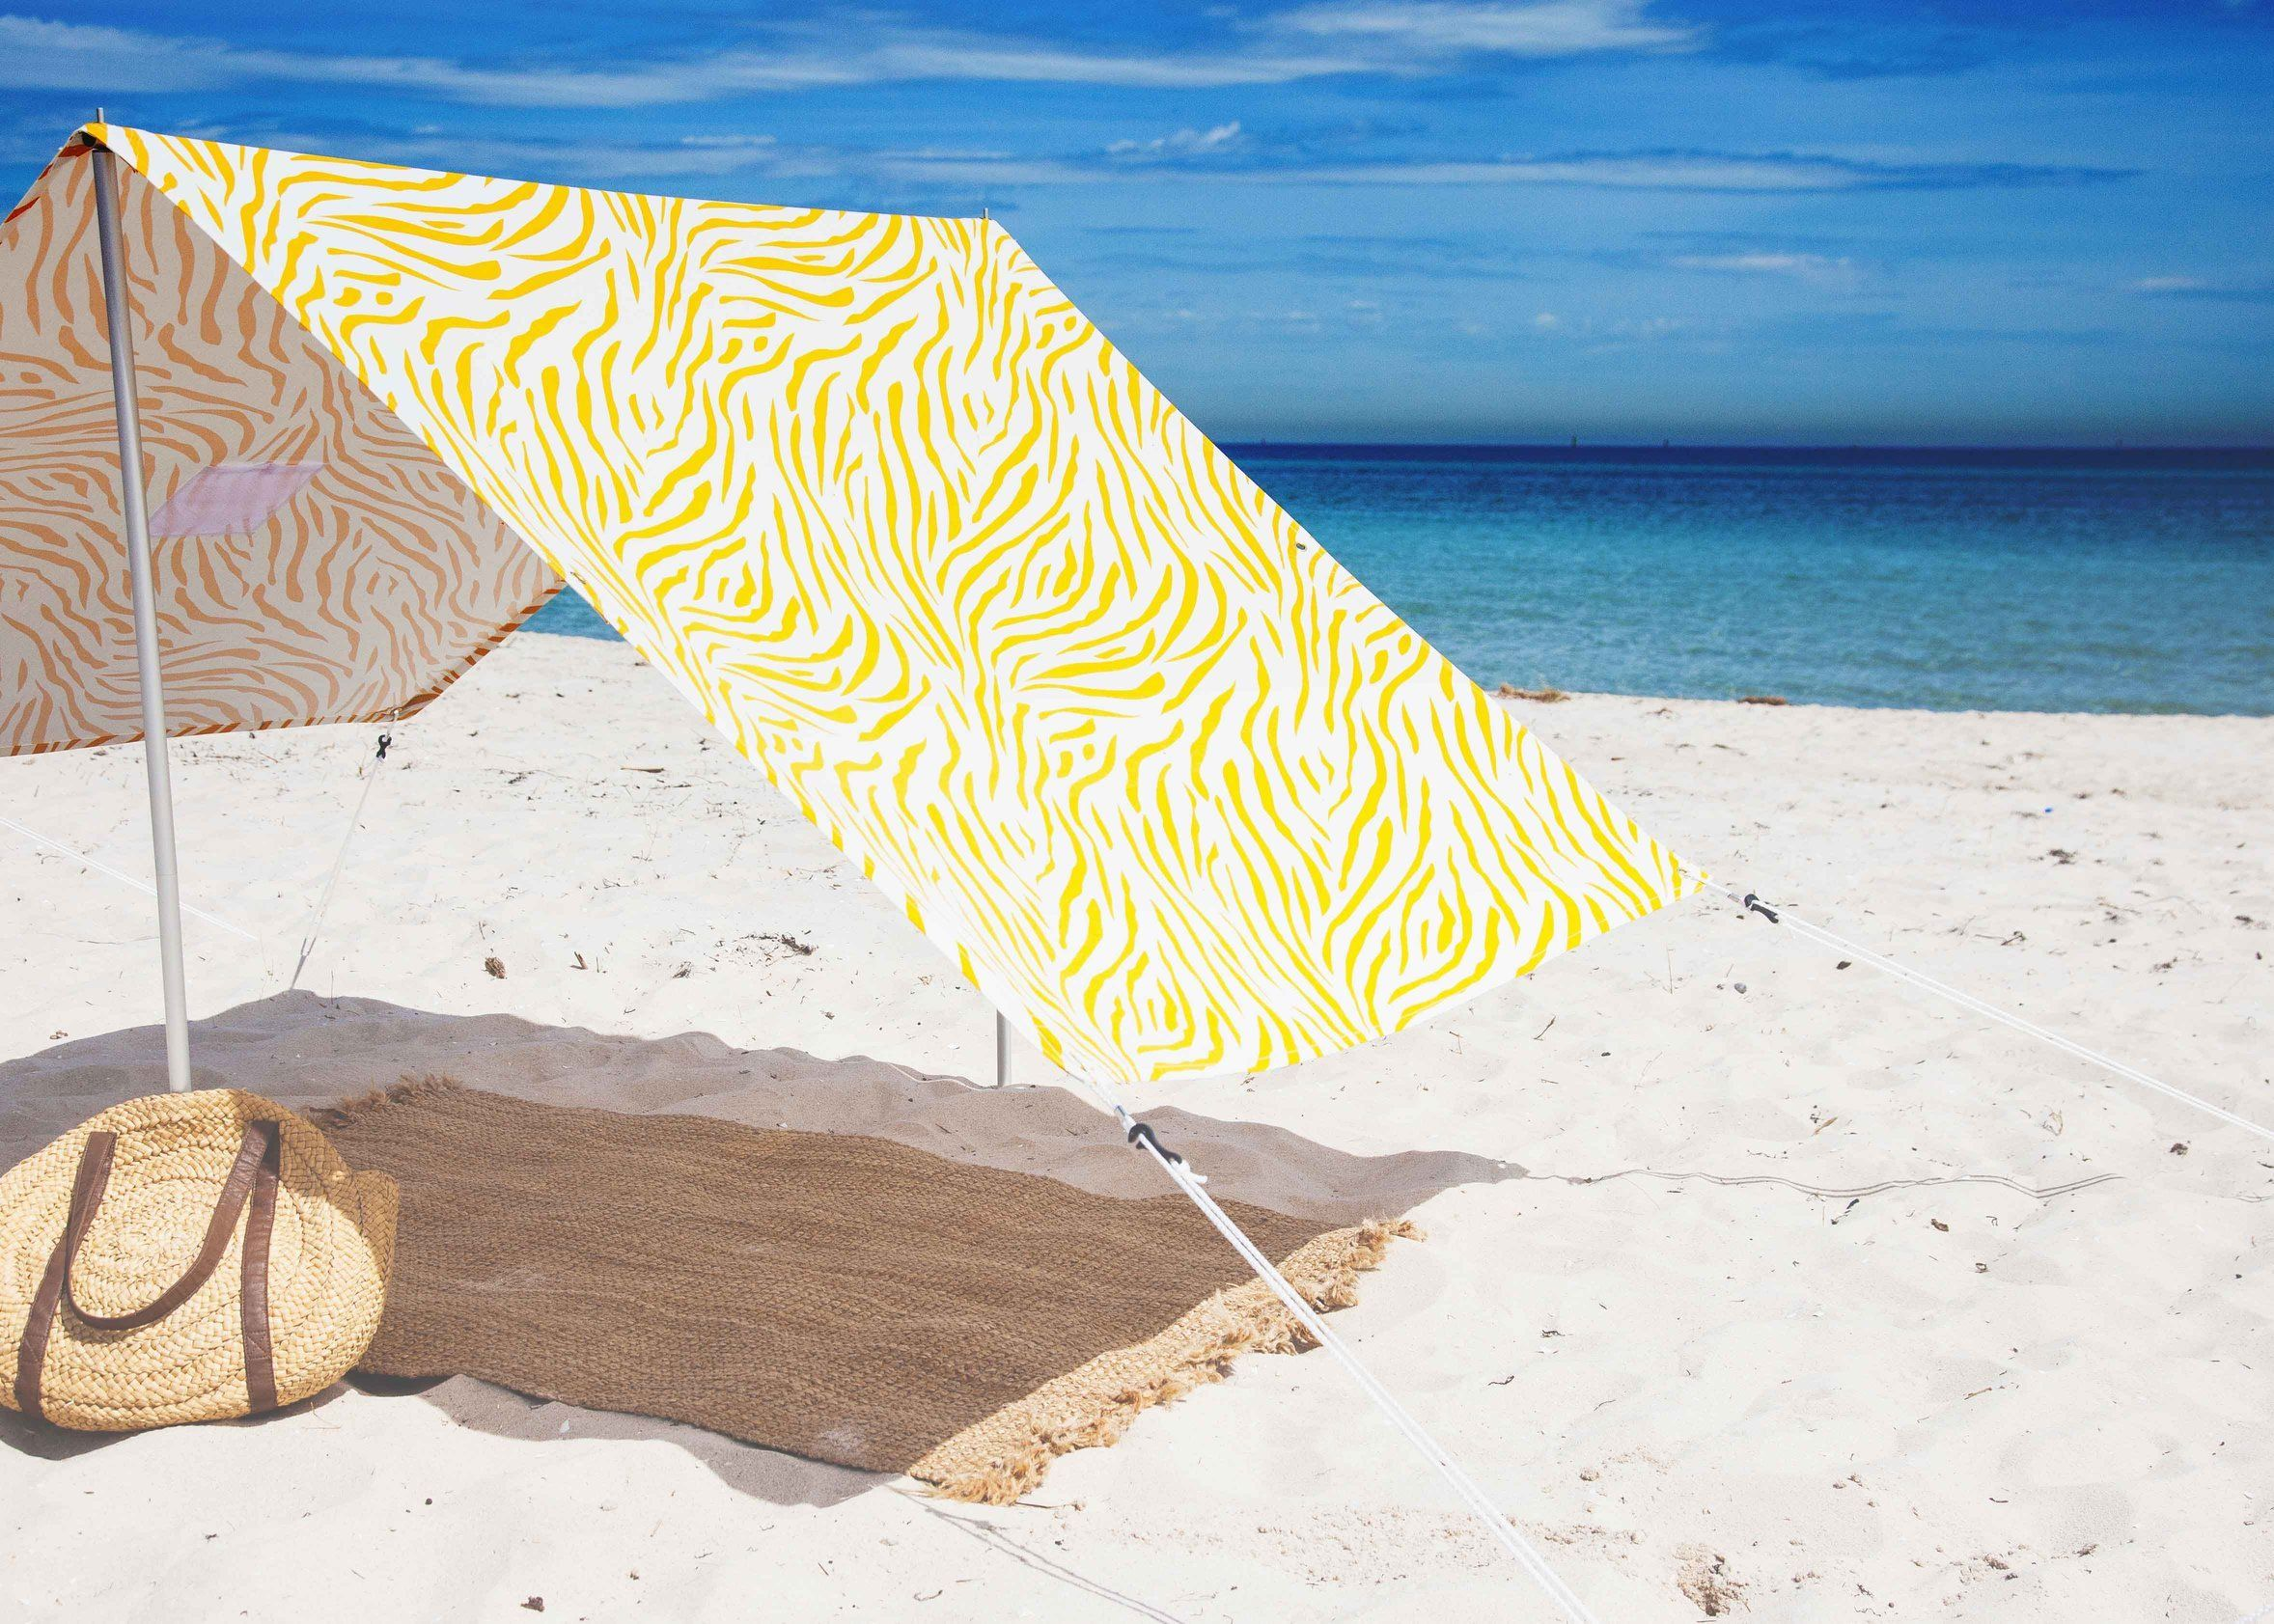 & Biarritz beach tent | Beach tent